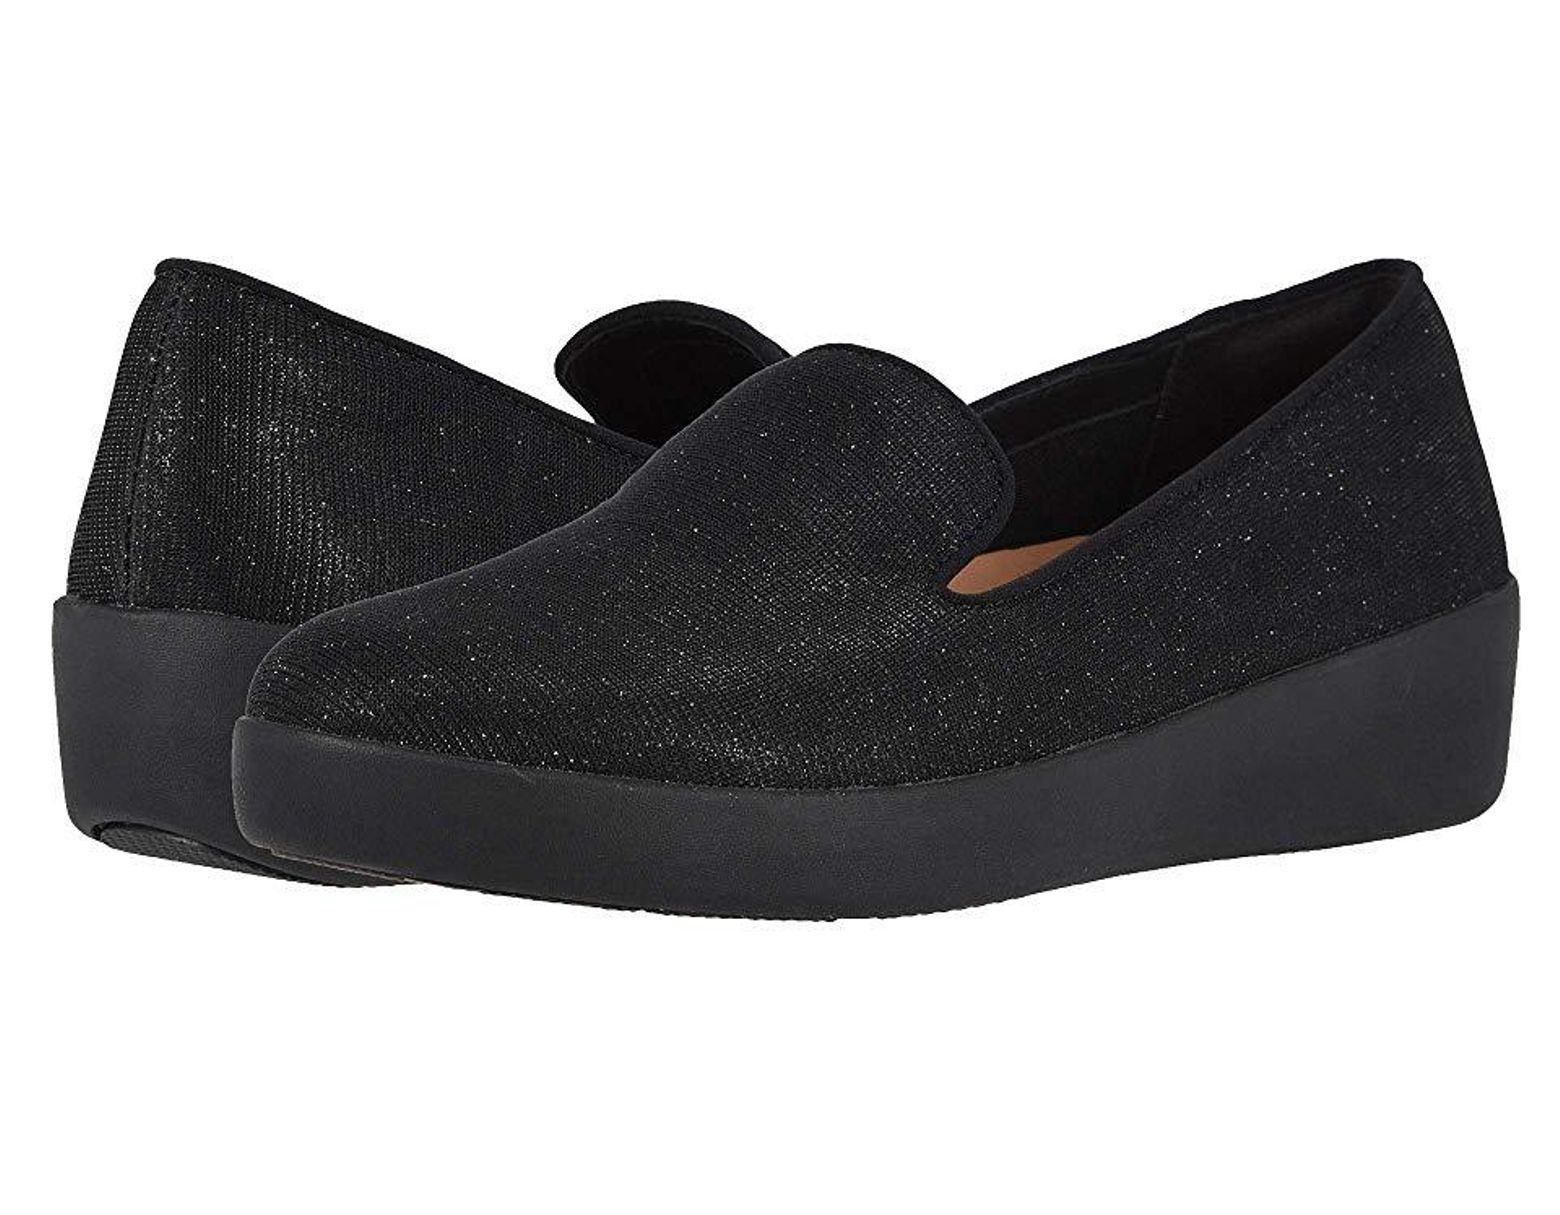 b66f20ab6b Fitflop Audrey Glitzy (black) Shoes in Black - Save 36% - Lyst